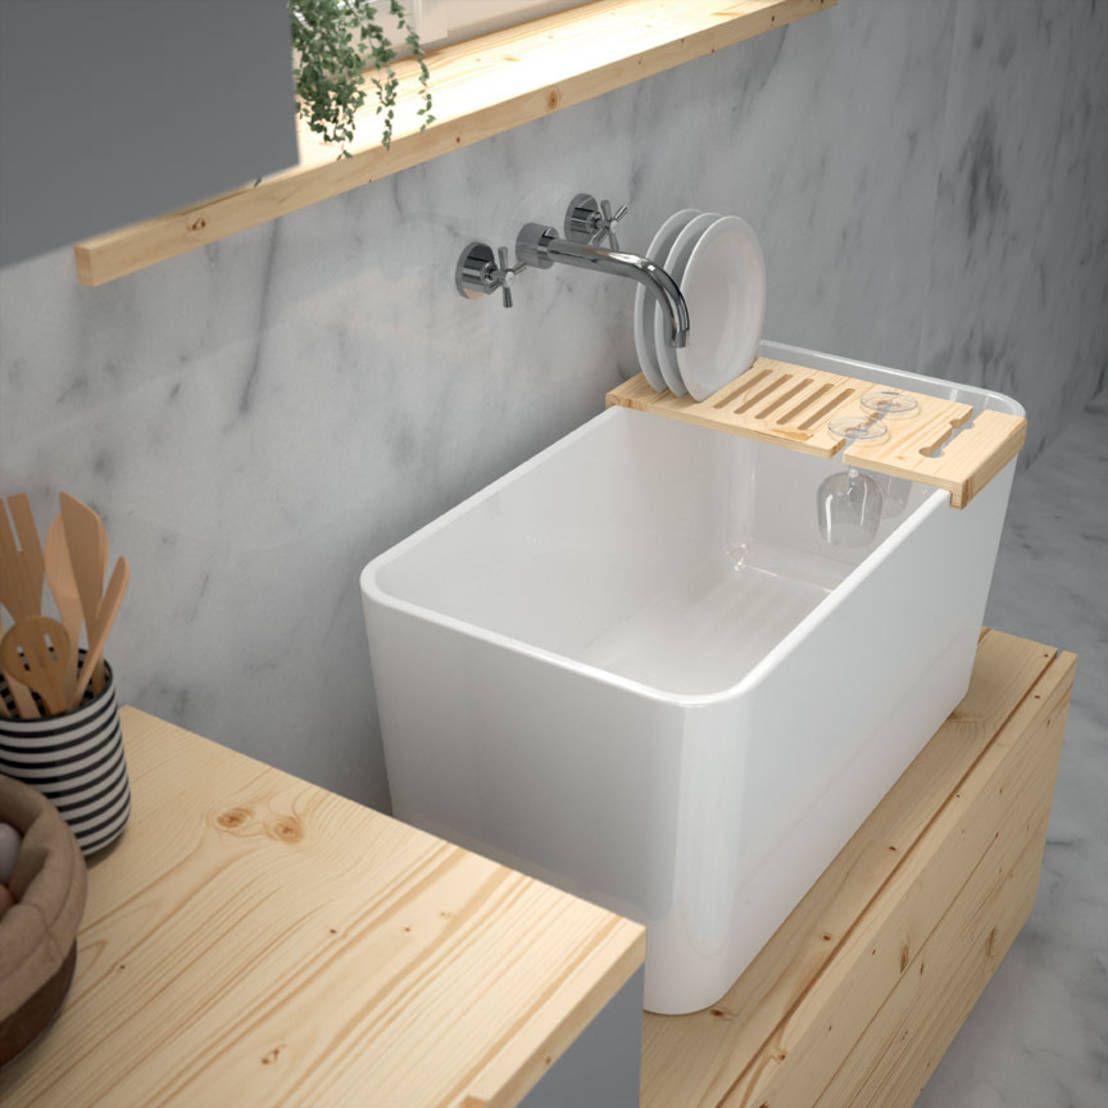 Salle De Bain Architecte D'Interieur ~ Una Cucina Comoda Comoda Ecco Come Cuisines Et D Co